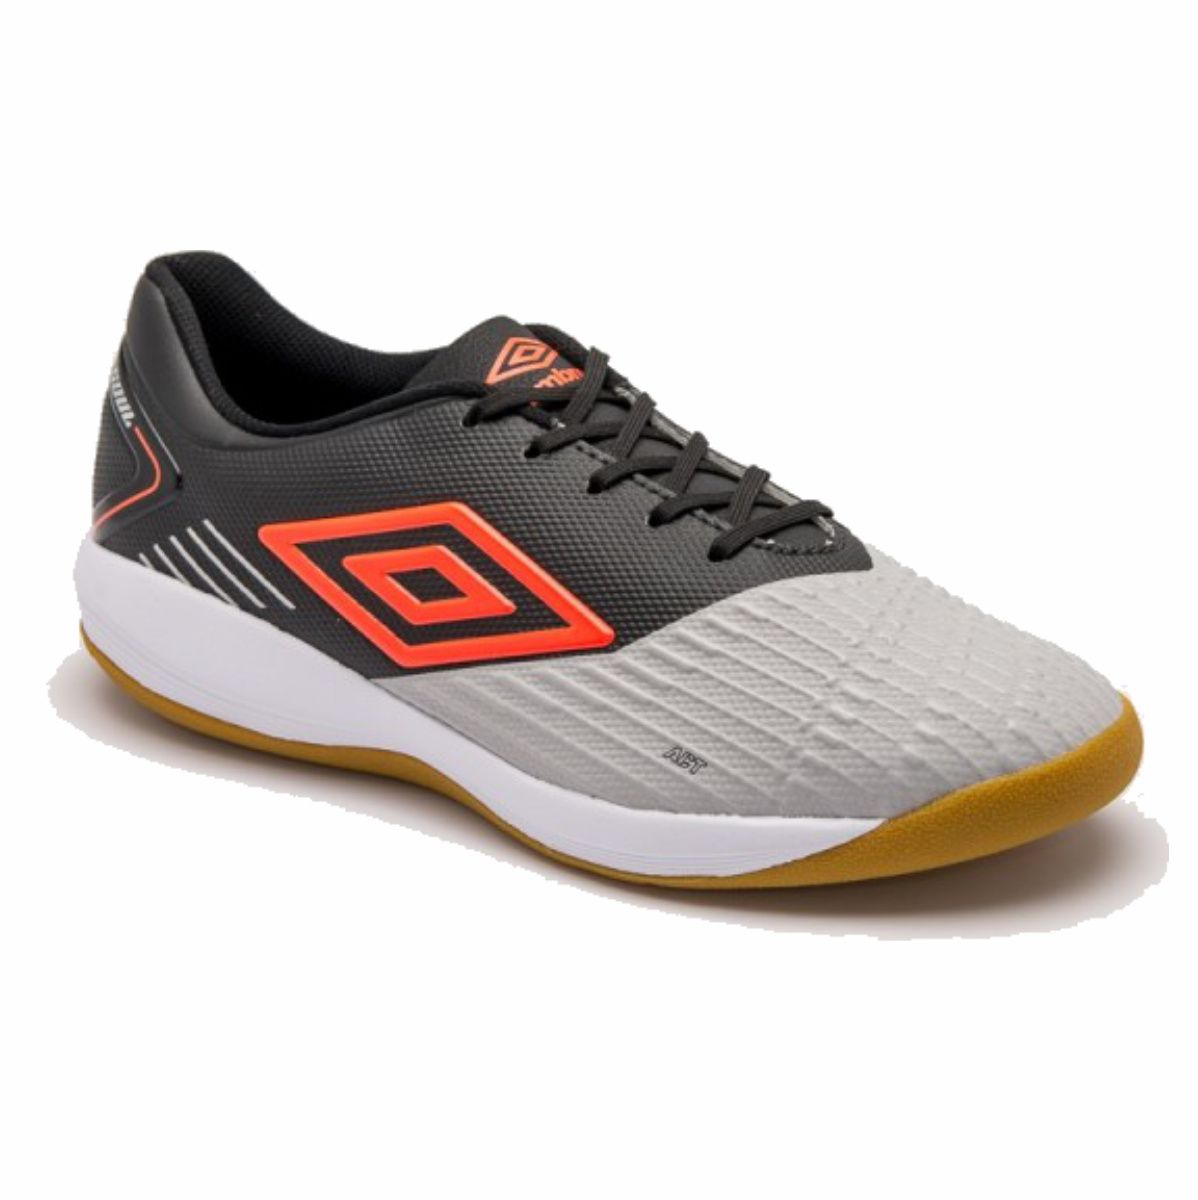 Tenis Umbro Soul Ii Pro 2 Chuteira Indoor Futsal